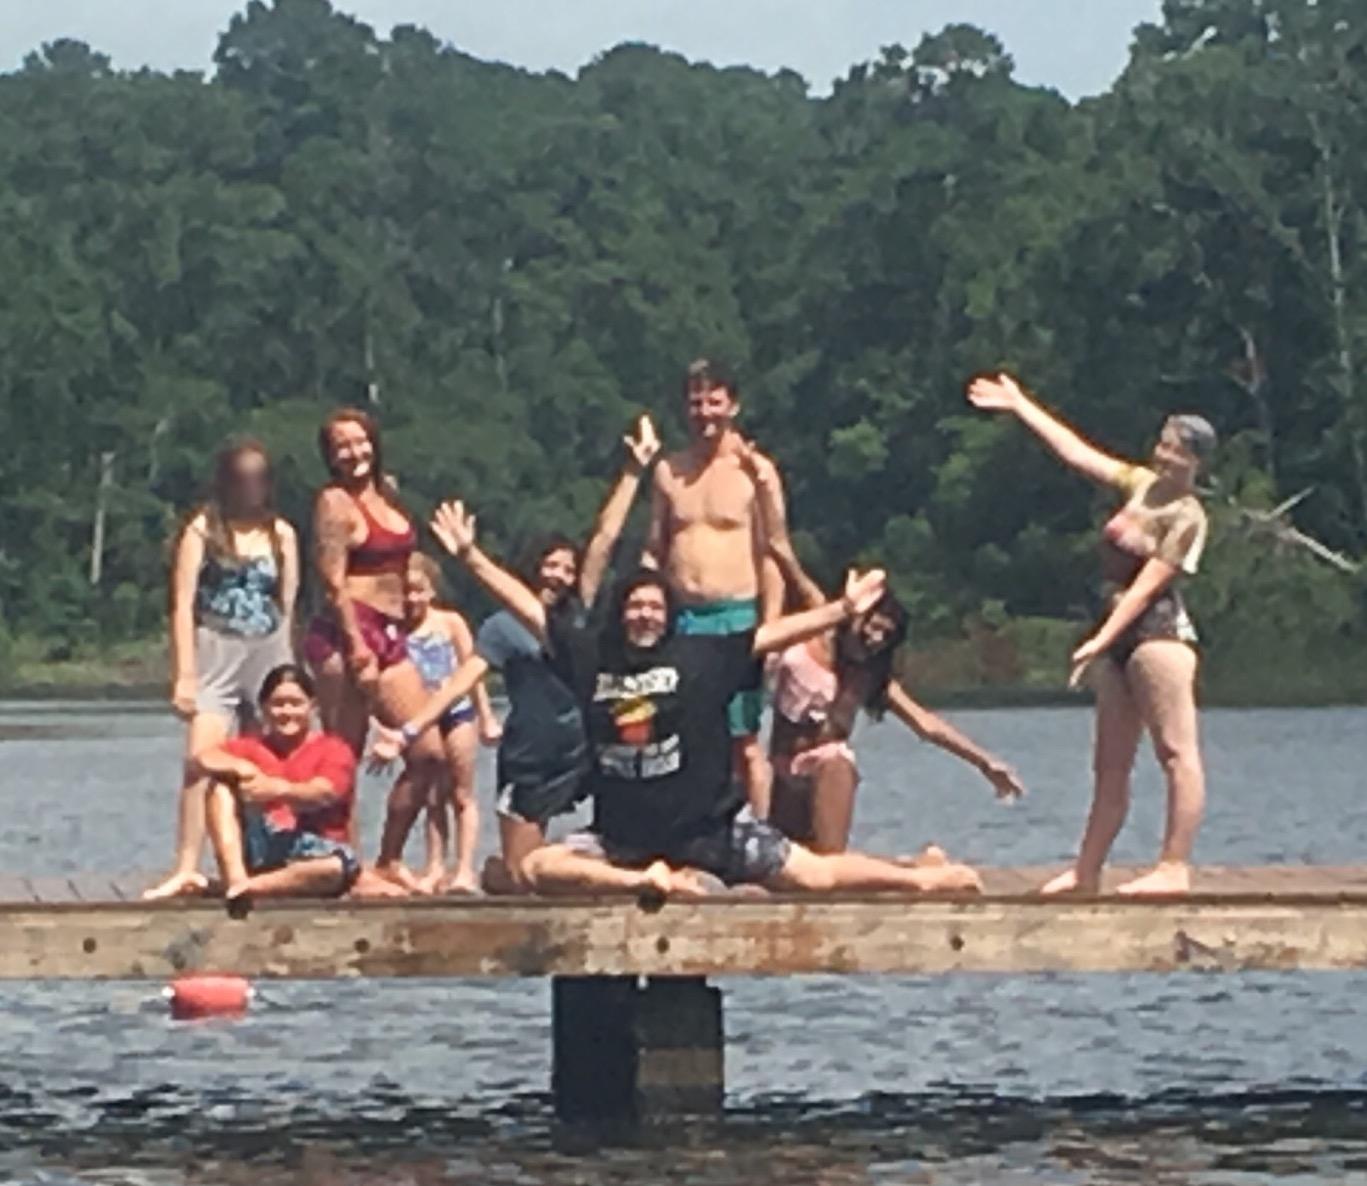 Backpacking Camp Swimming at the lake